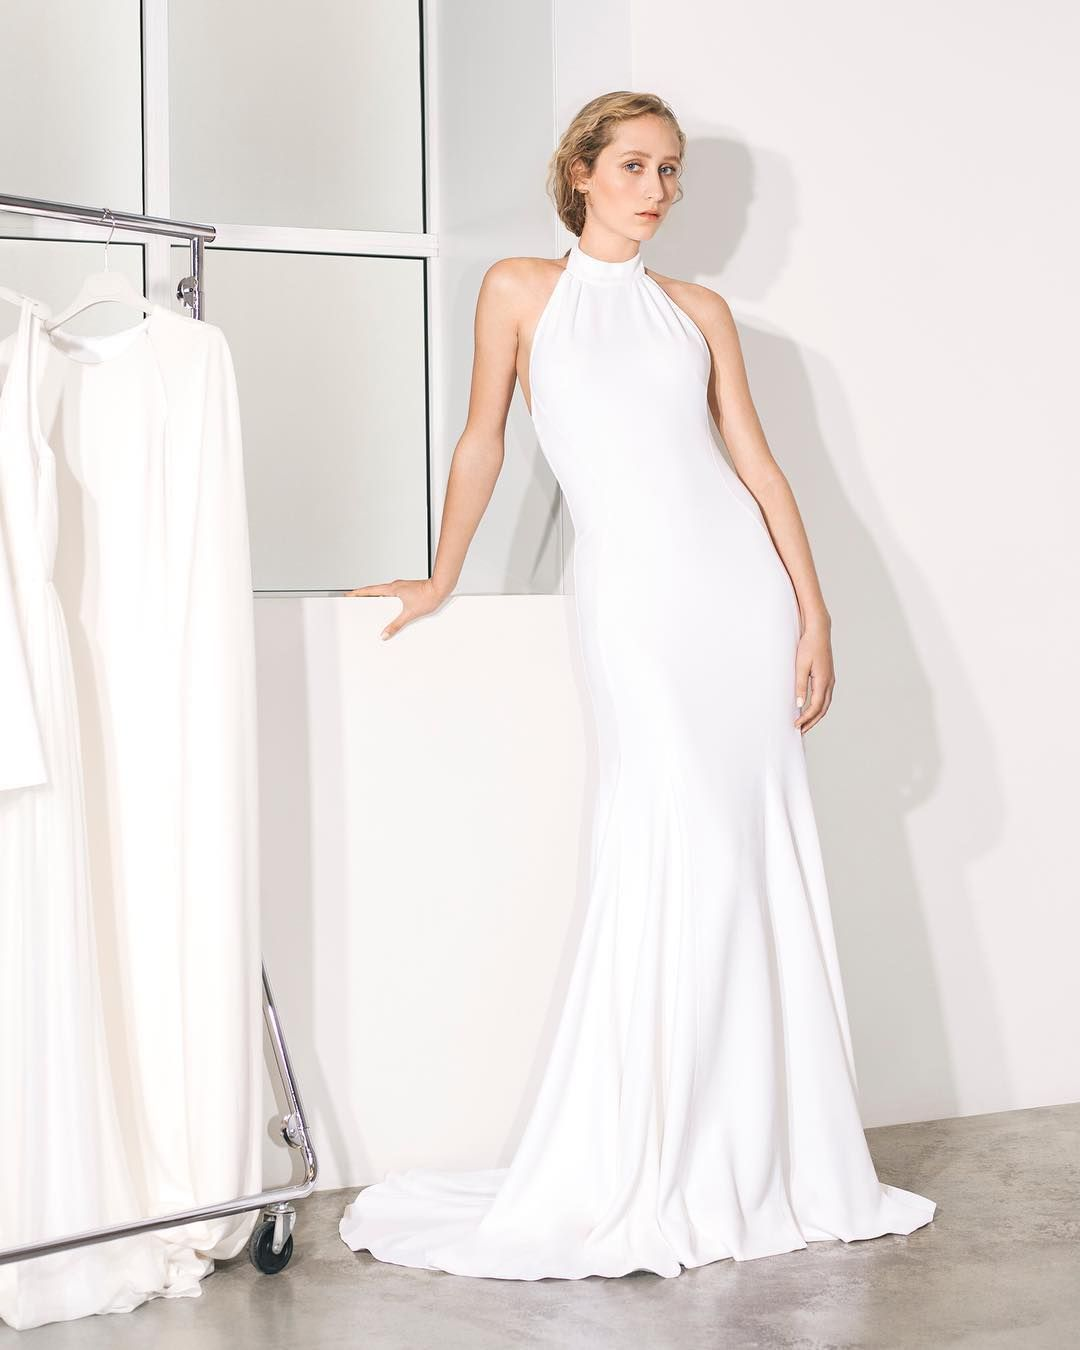 Stella Mccartney The Magnolia Gown From Our New Bridal Collection Stylst Segundo Vestido De Casamento Vestidos Para Recepcao De Casamento Vestido Casamento Civil [ 1350 x 1080 Pixel ]